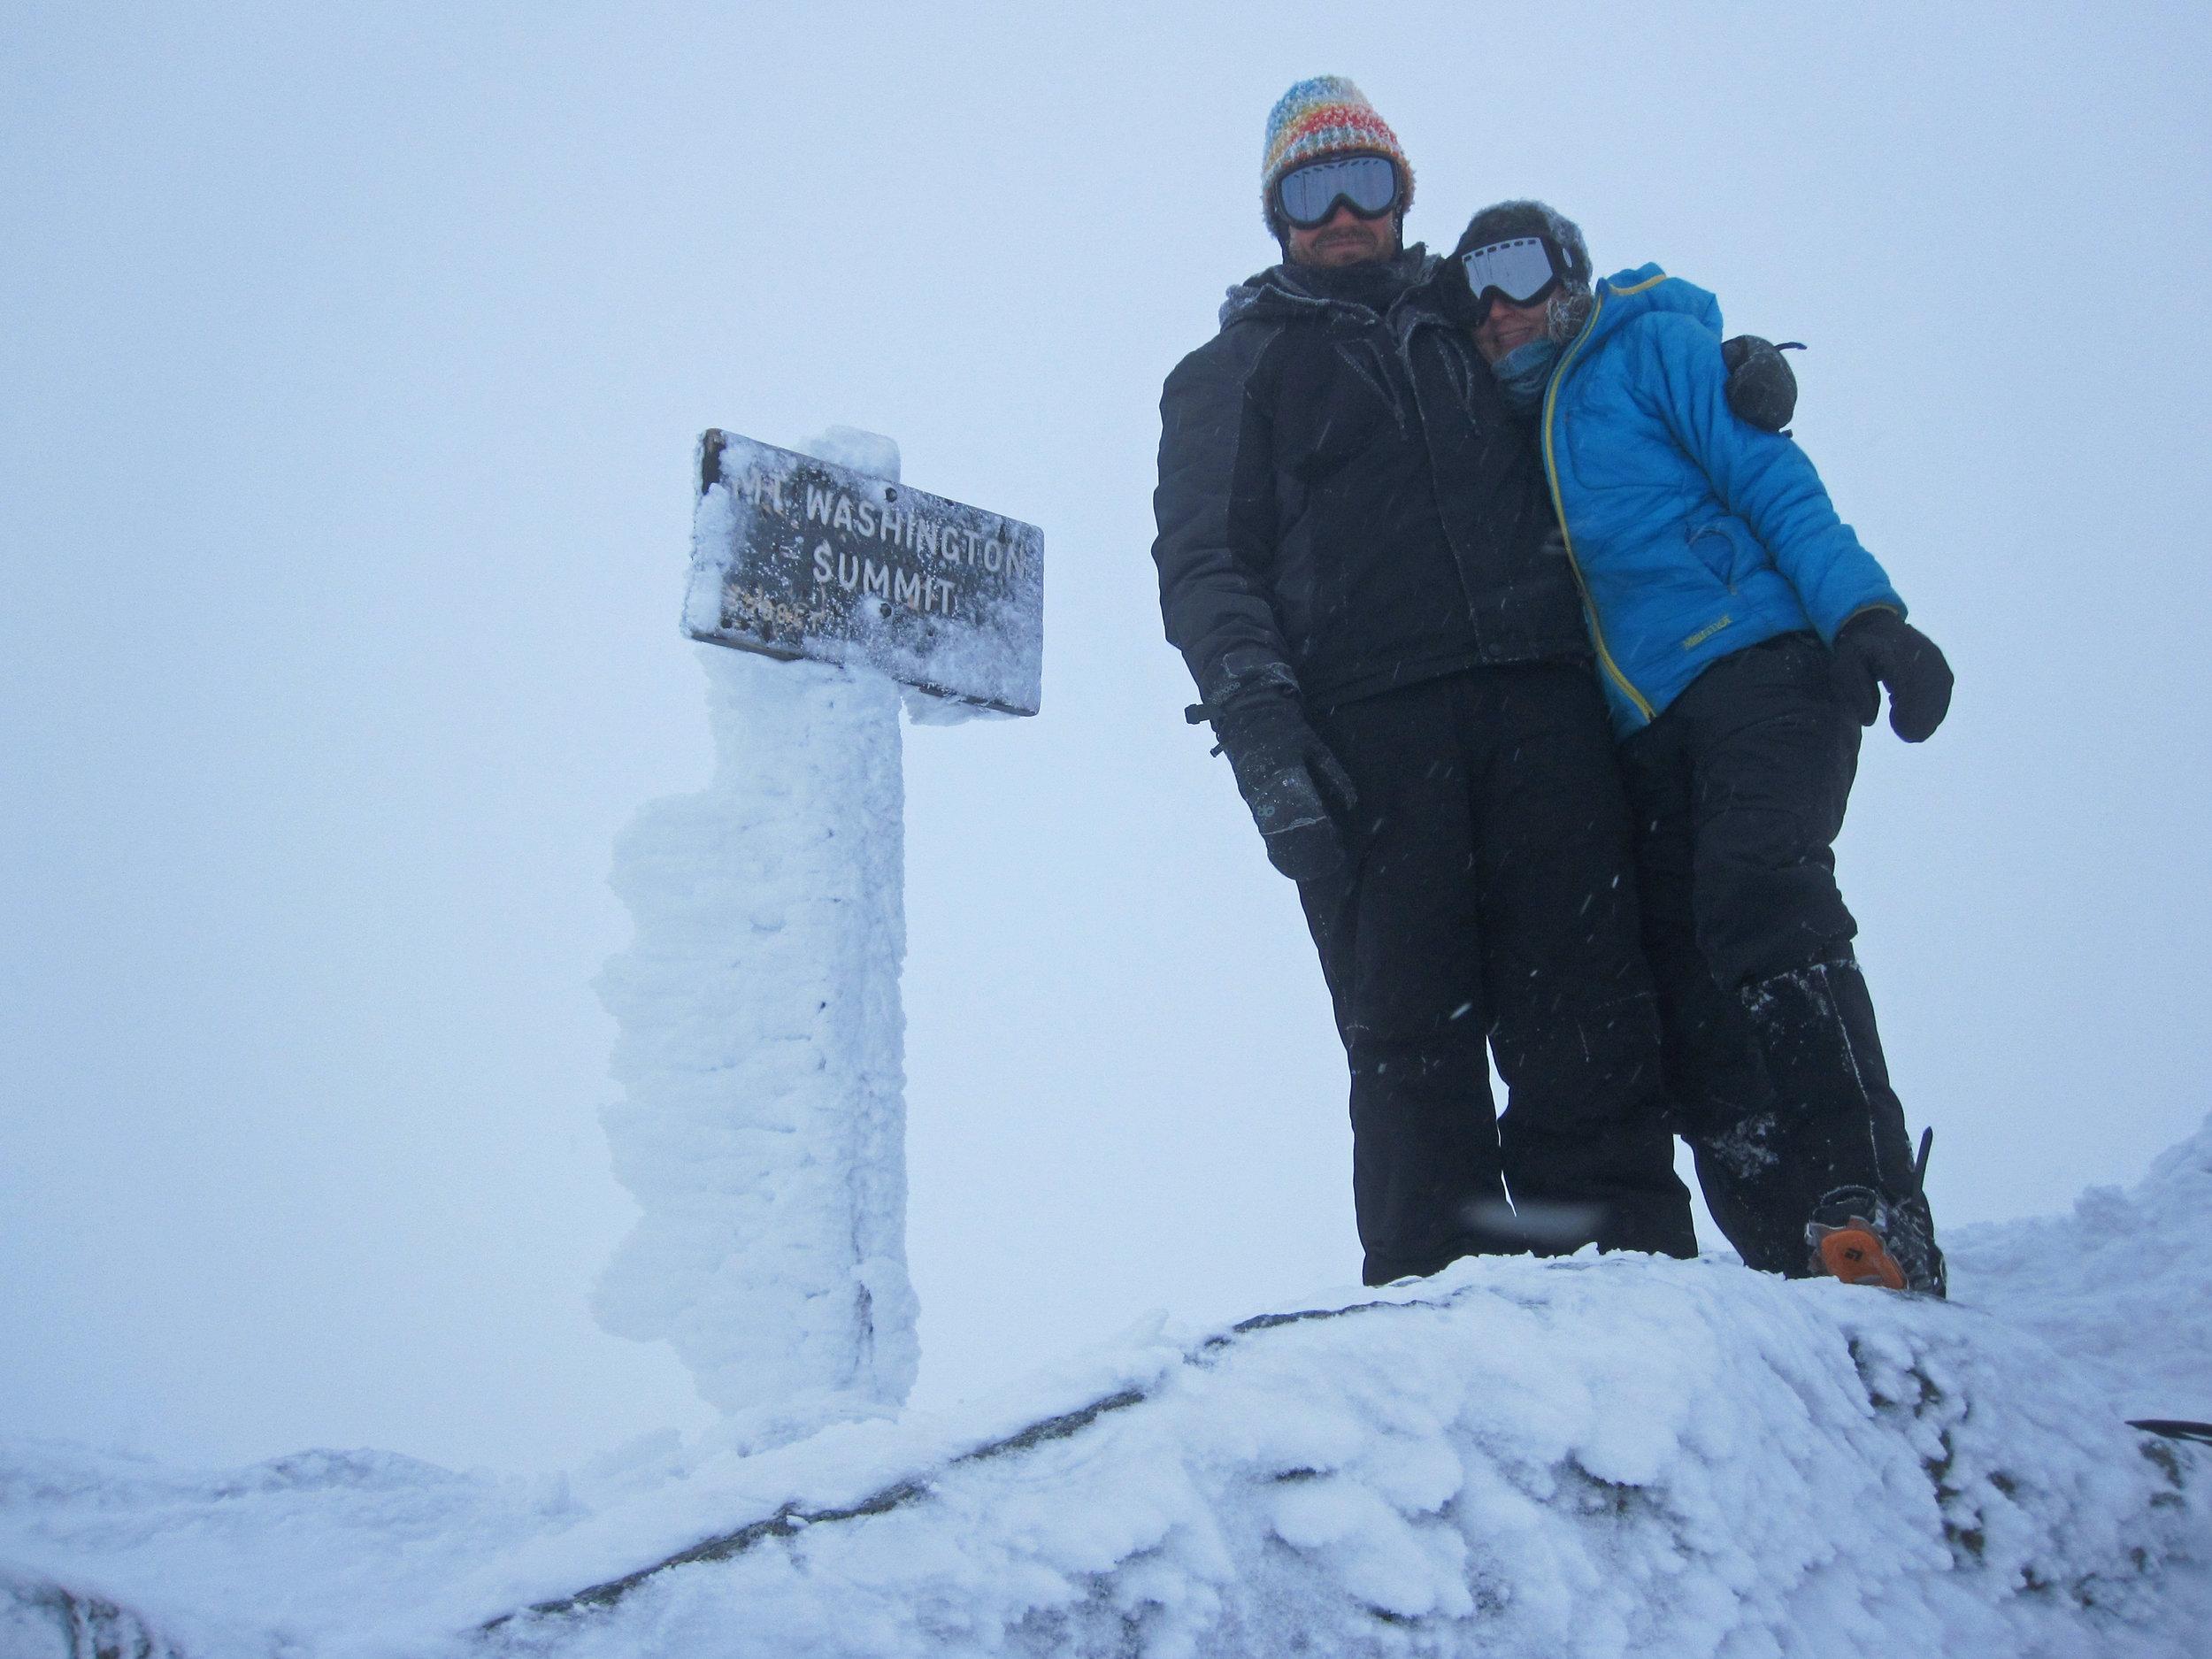 Chilly summit photo